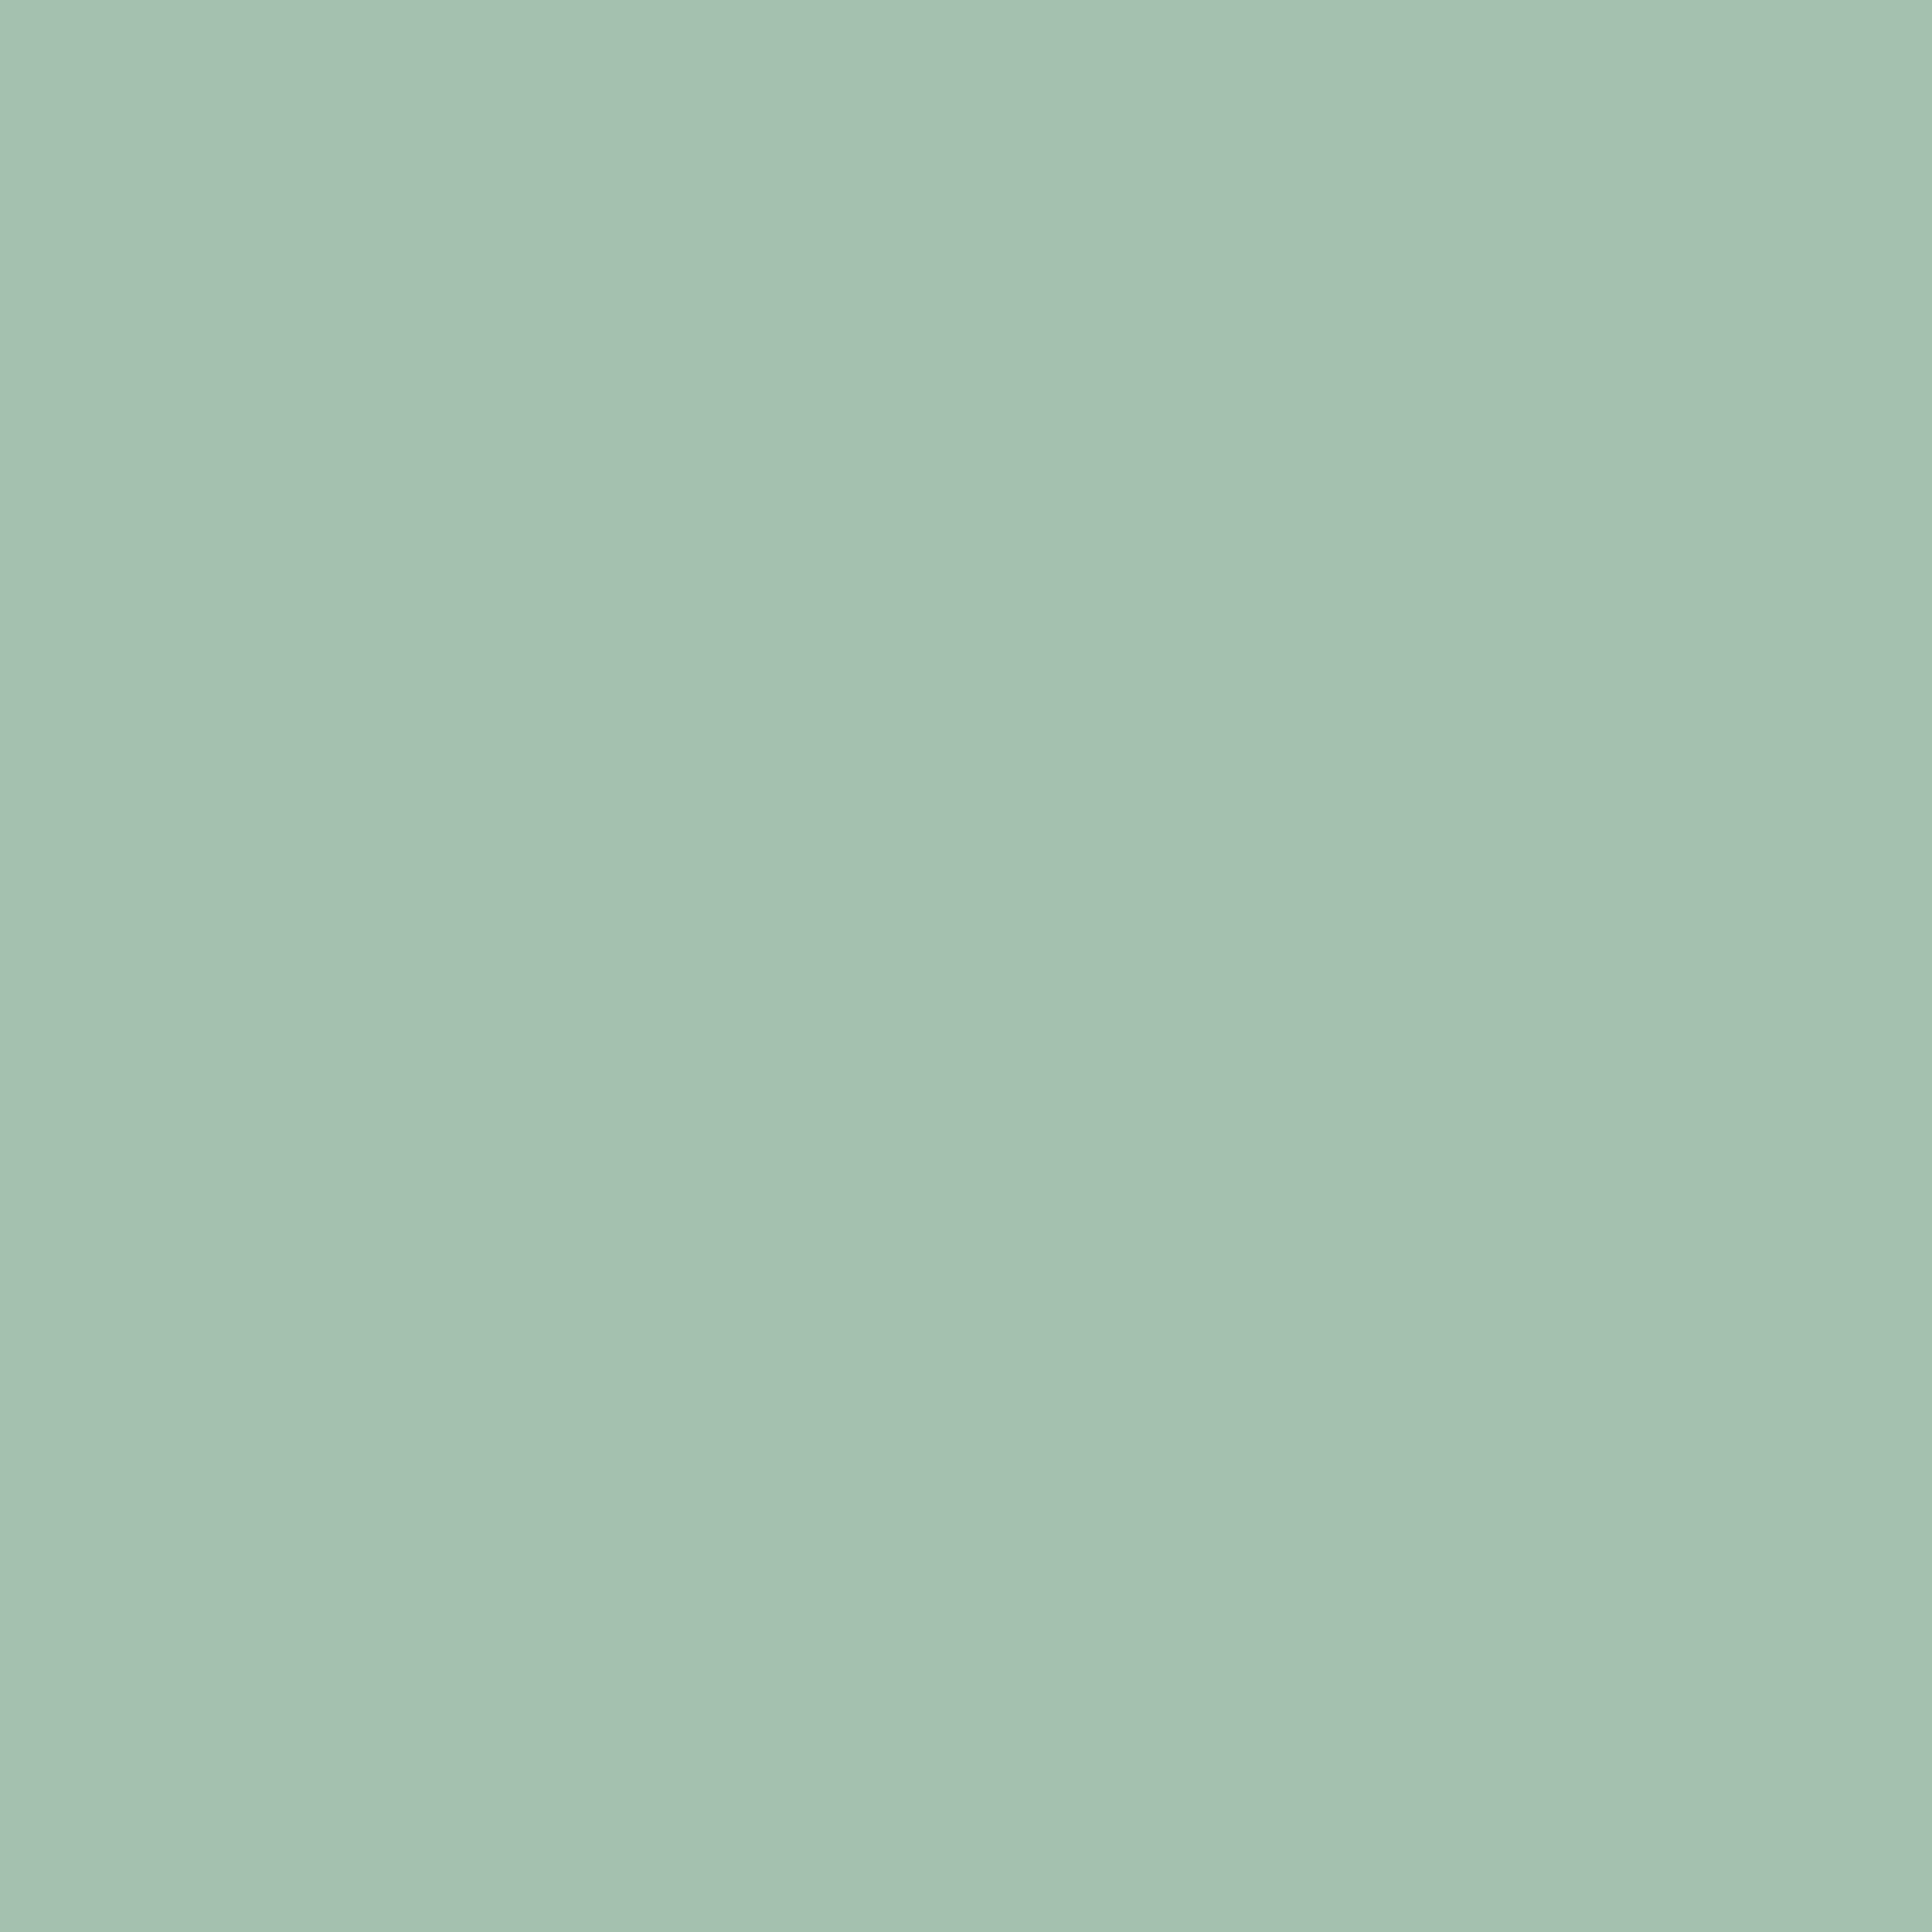 3600x3600 Cambridge Blue Solid Color Background